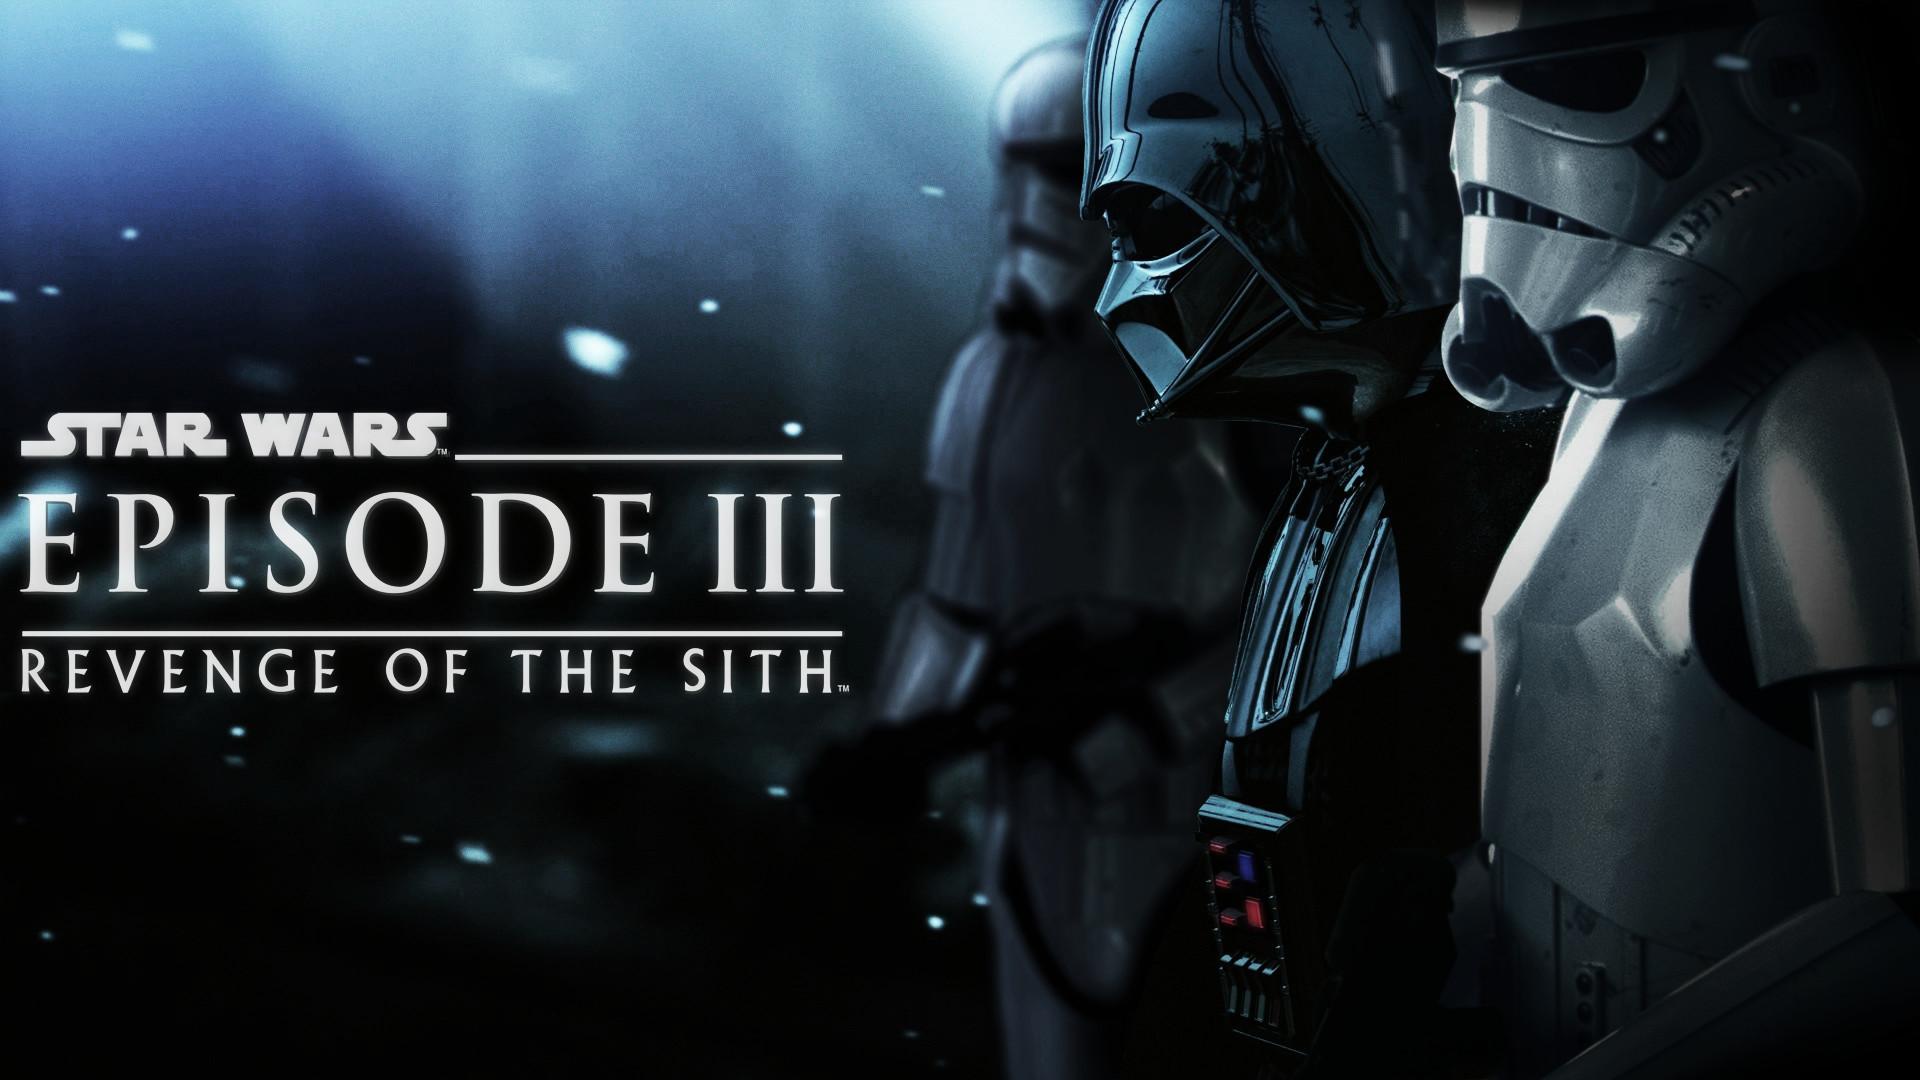 … GoldenFurryOfficial Star Wars Darth Vader Wallpaper by  GoldenFurryOfficial